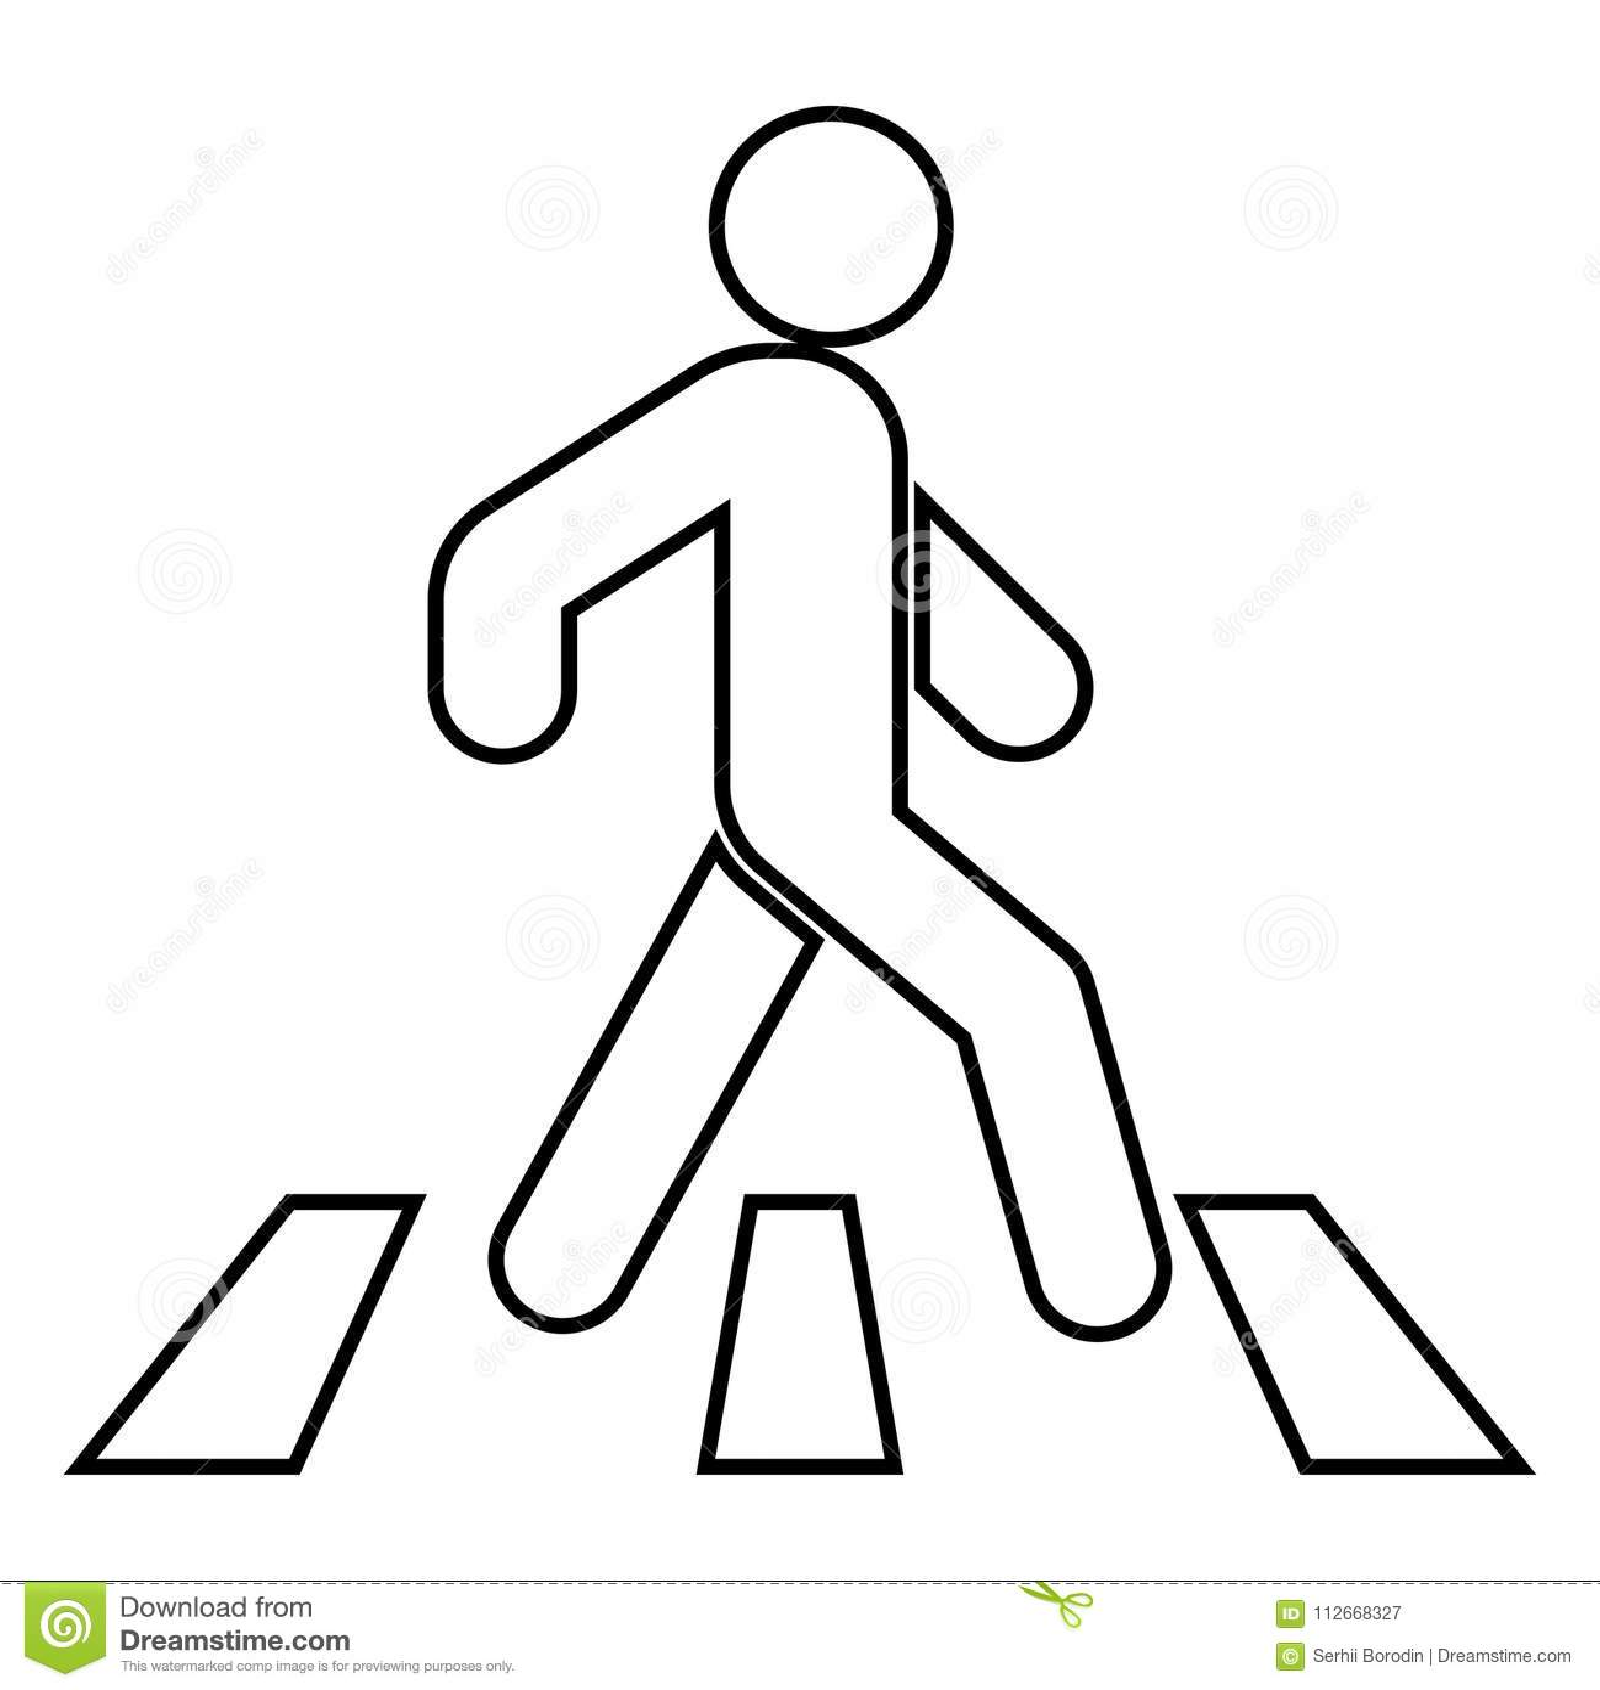 Pedestrian On Zebra Crossing Icon Black Color Illustration